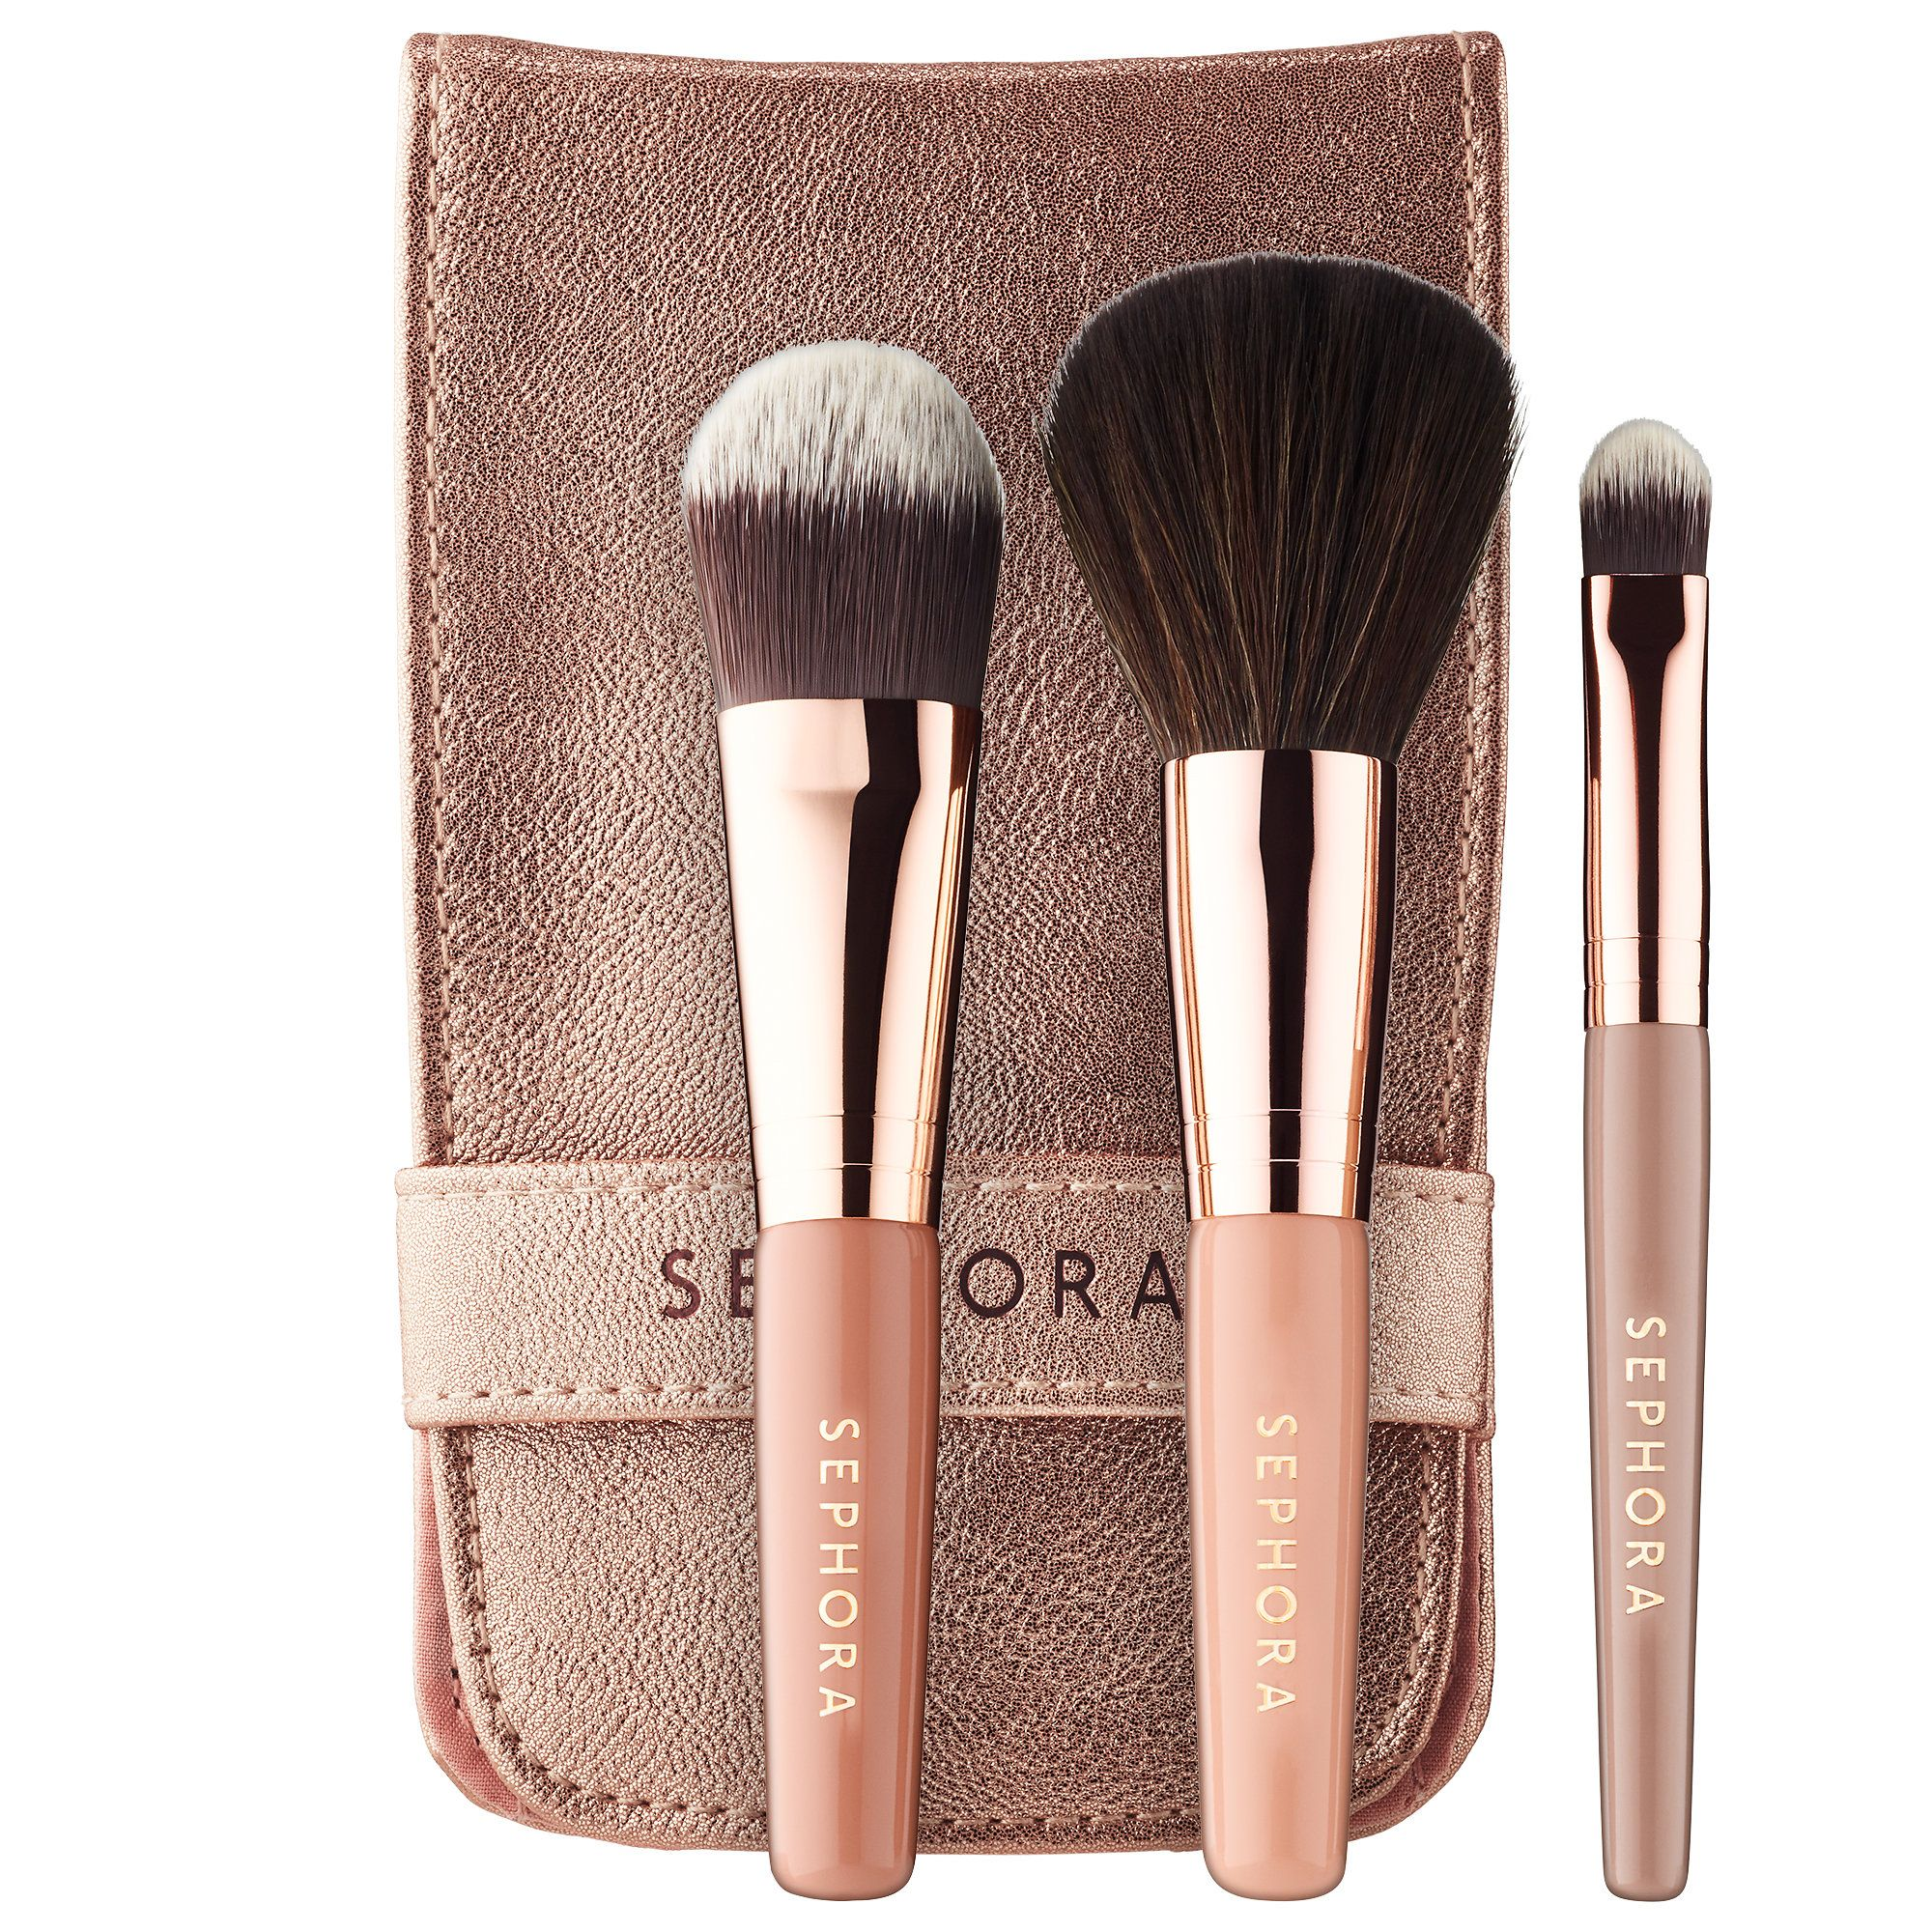 Ready in 5 Face Brush Set Face brush set, Face brush